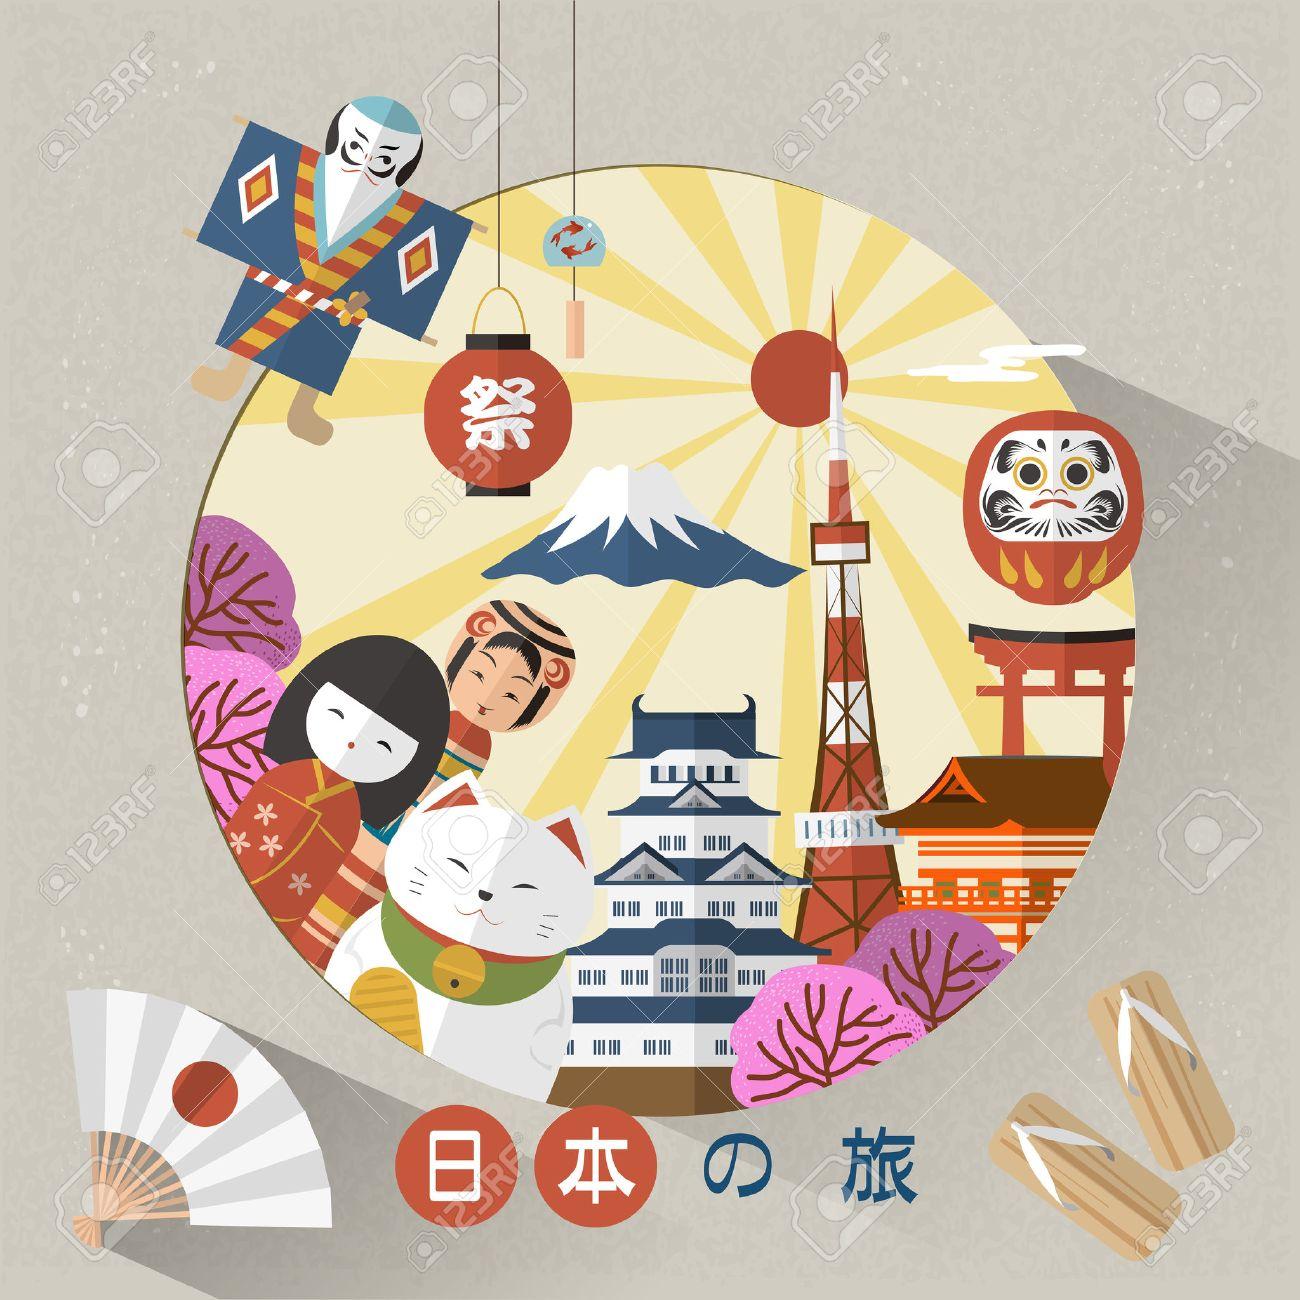 lovely Japan travel poster - Japan Travel and Festival in Japanese words - 50046081